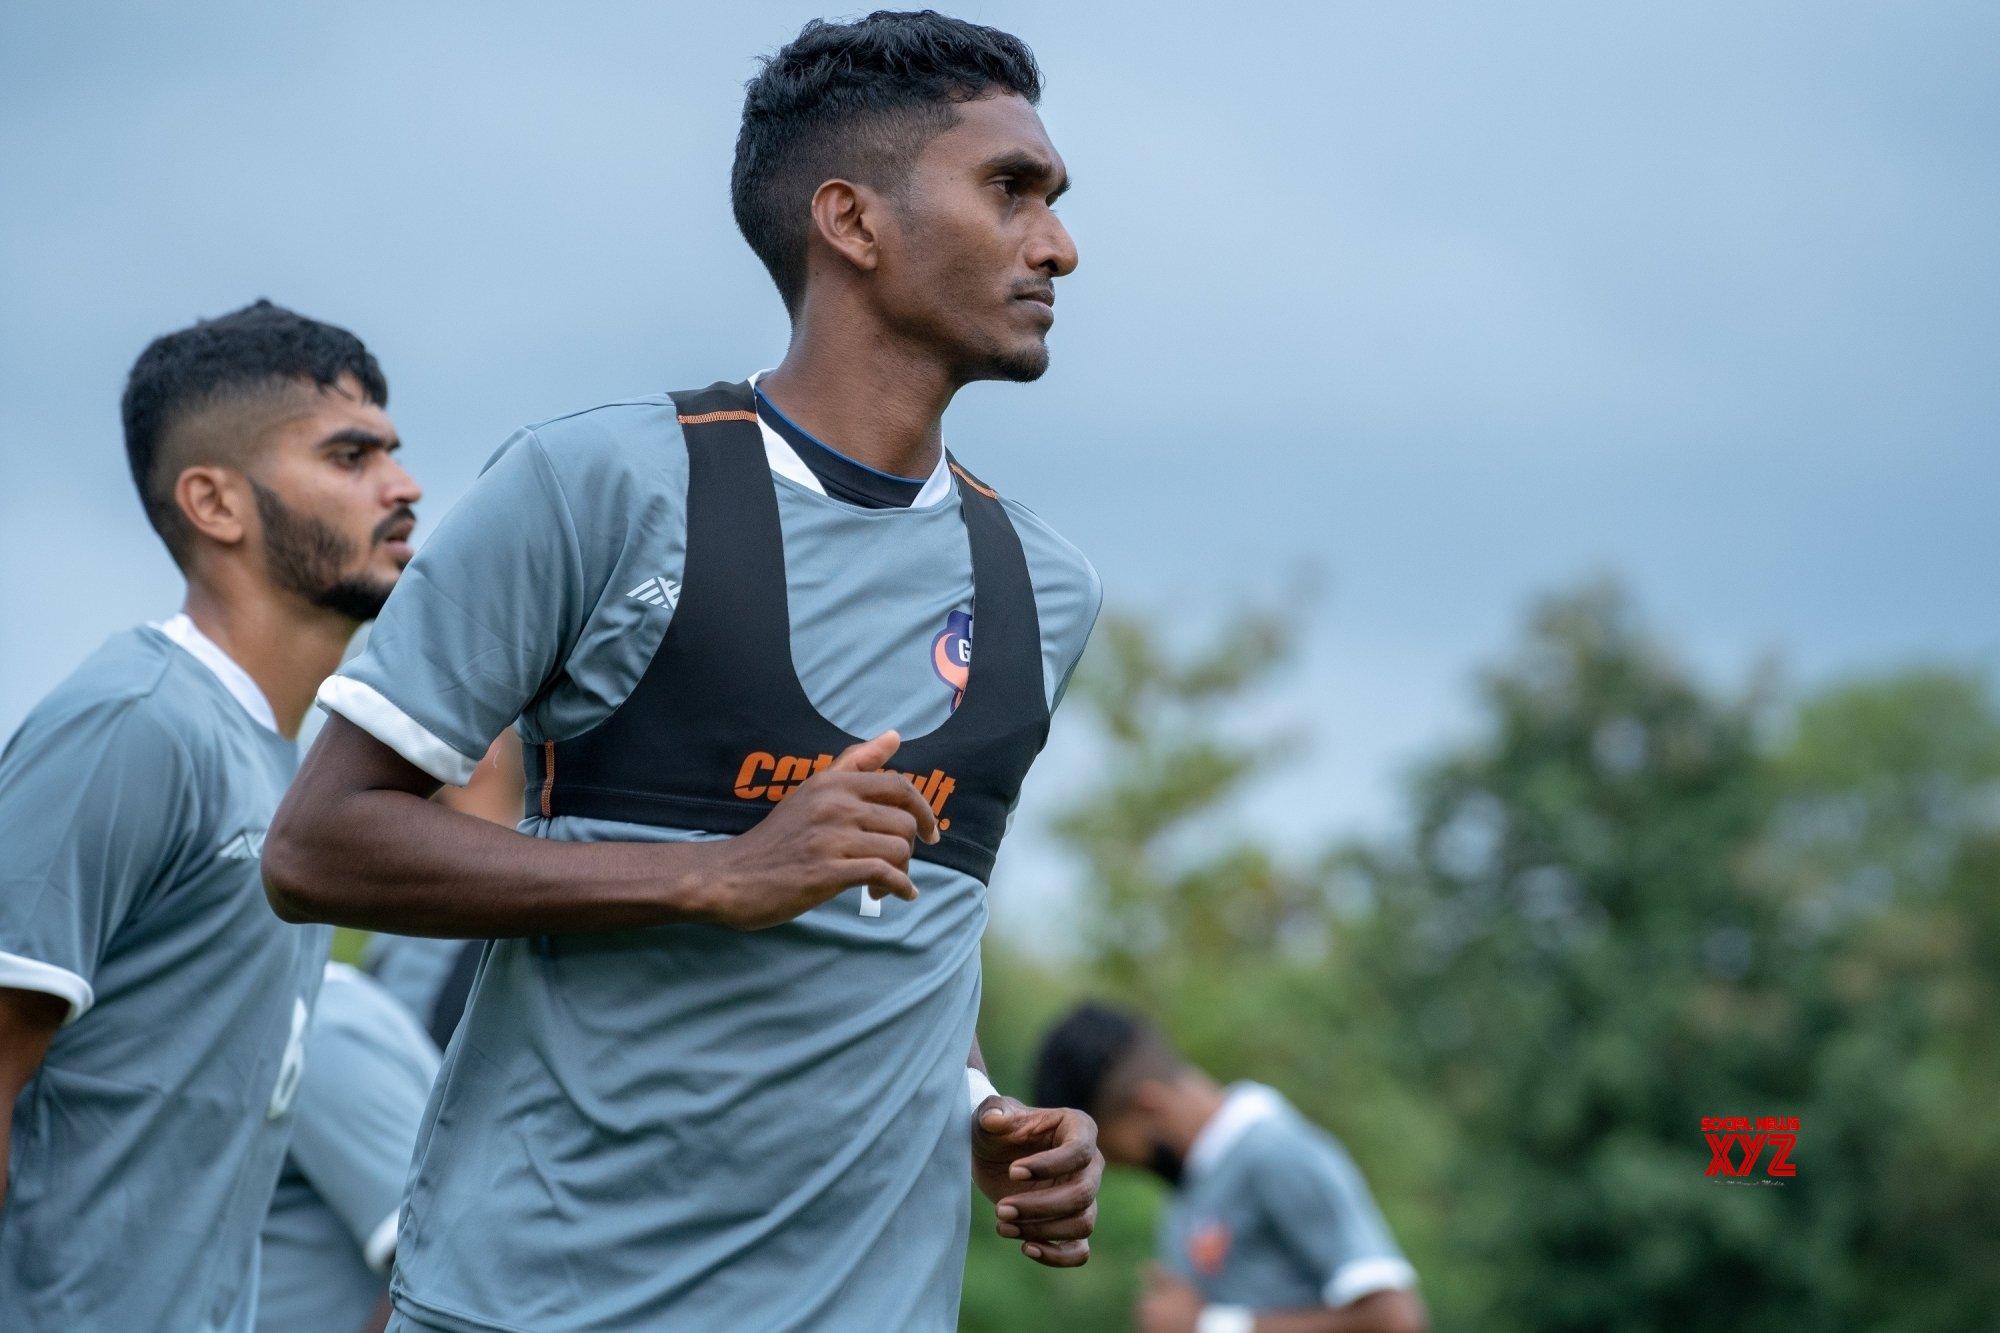 New-look FC Goa look to overcome Bengaluru challenge